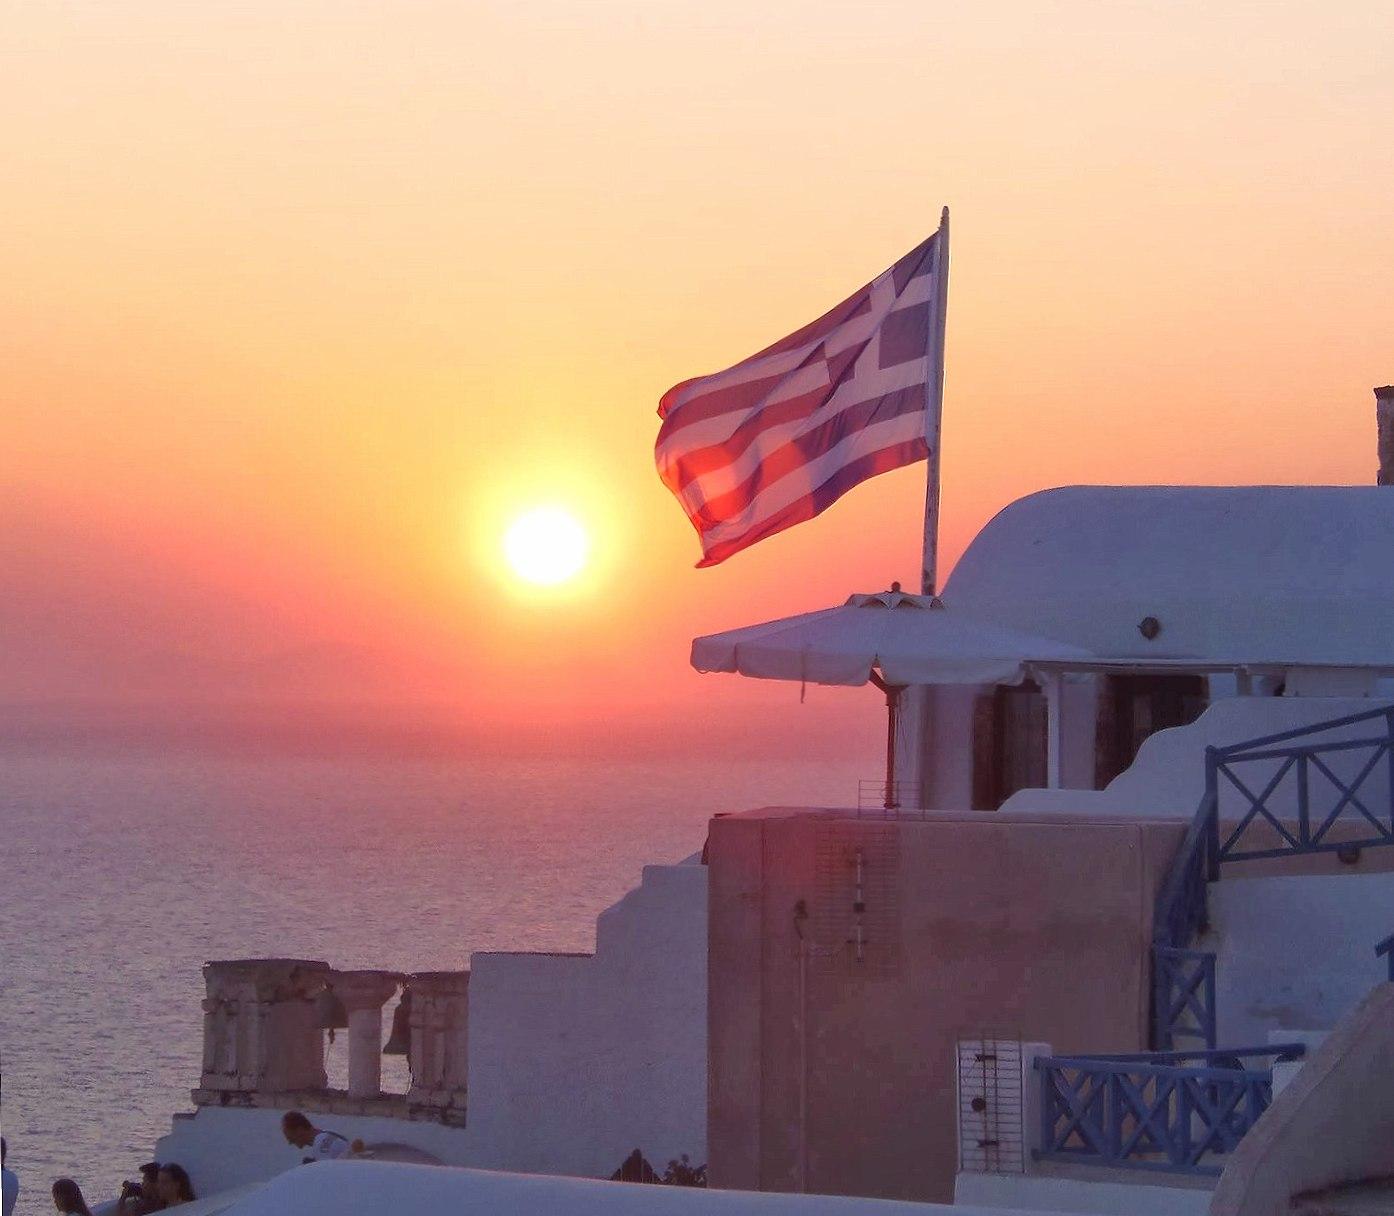 Santorini sunset wallpapers HD quality